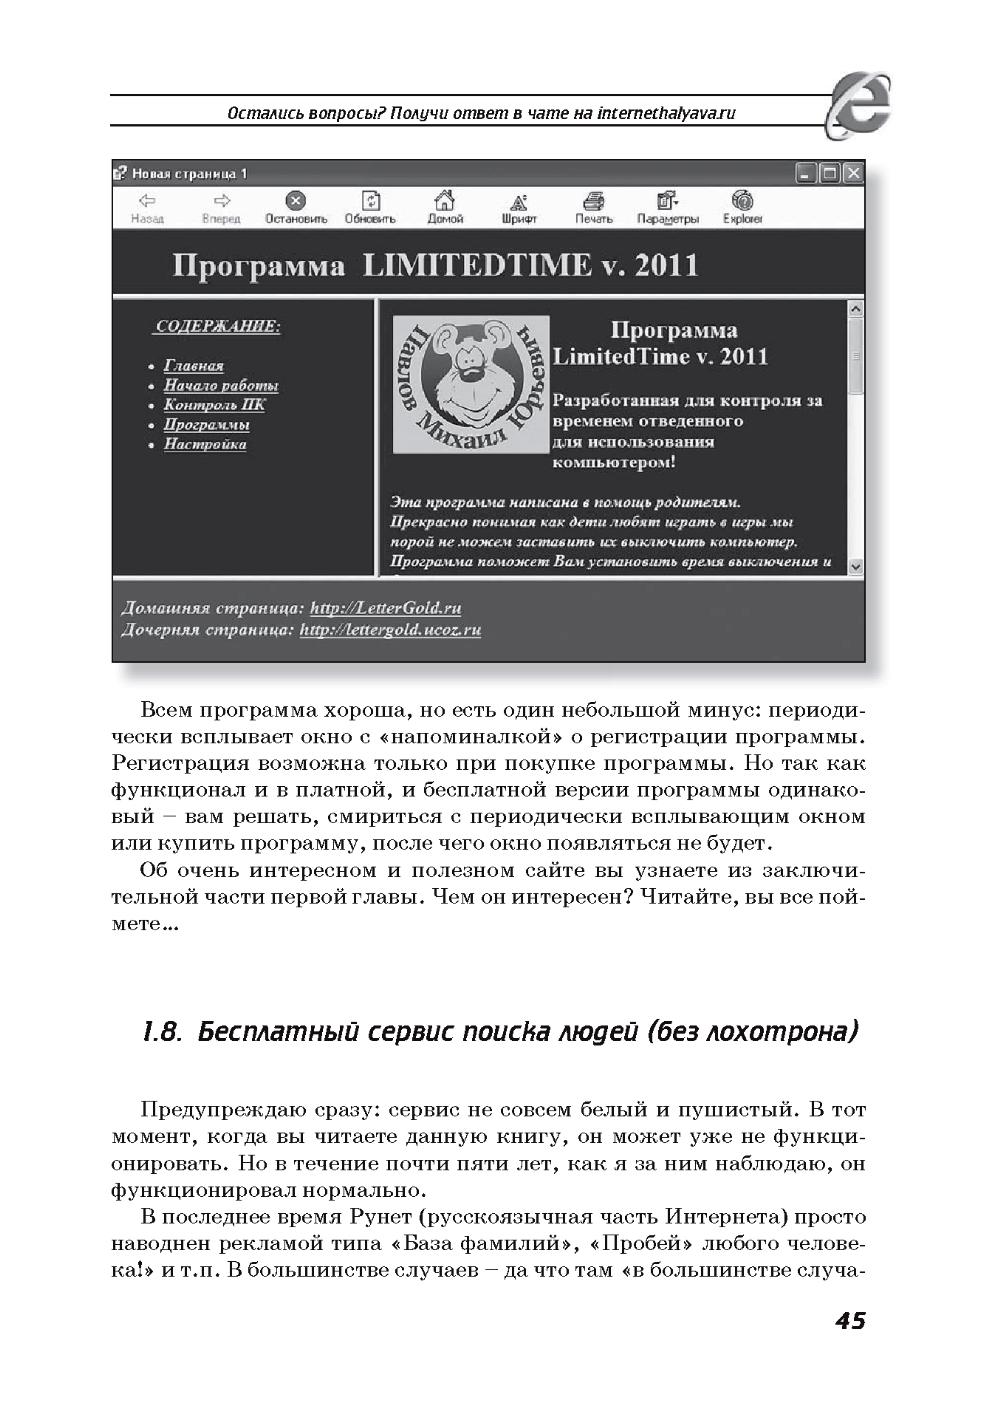 http://i6.imageban.ru/out/2013/11/04/9690c0e0525dbdca0cf76f6c83924fc5.jpg